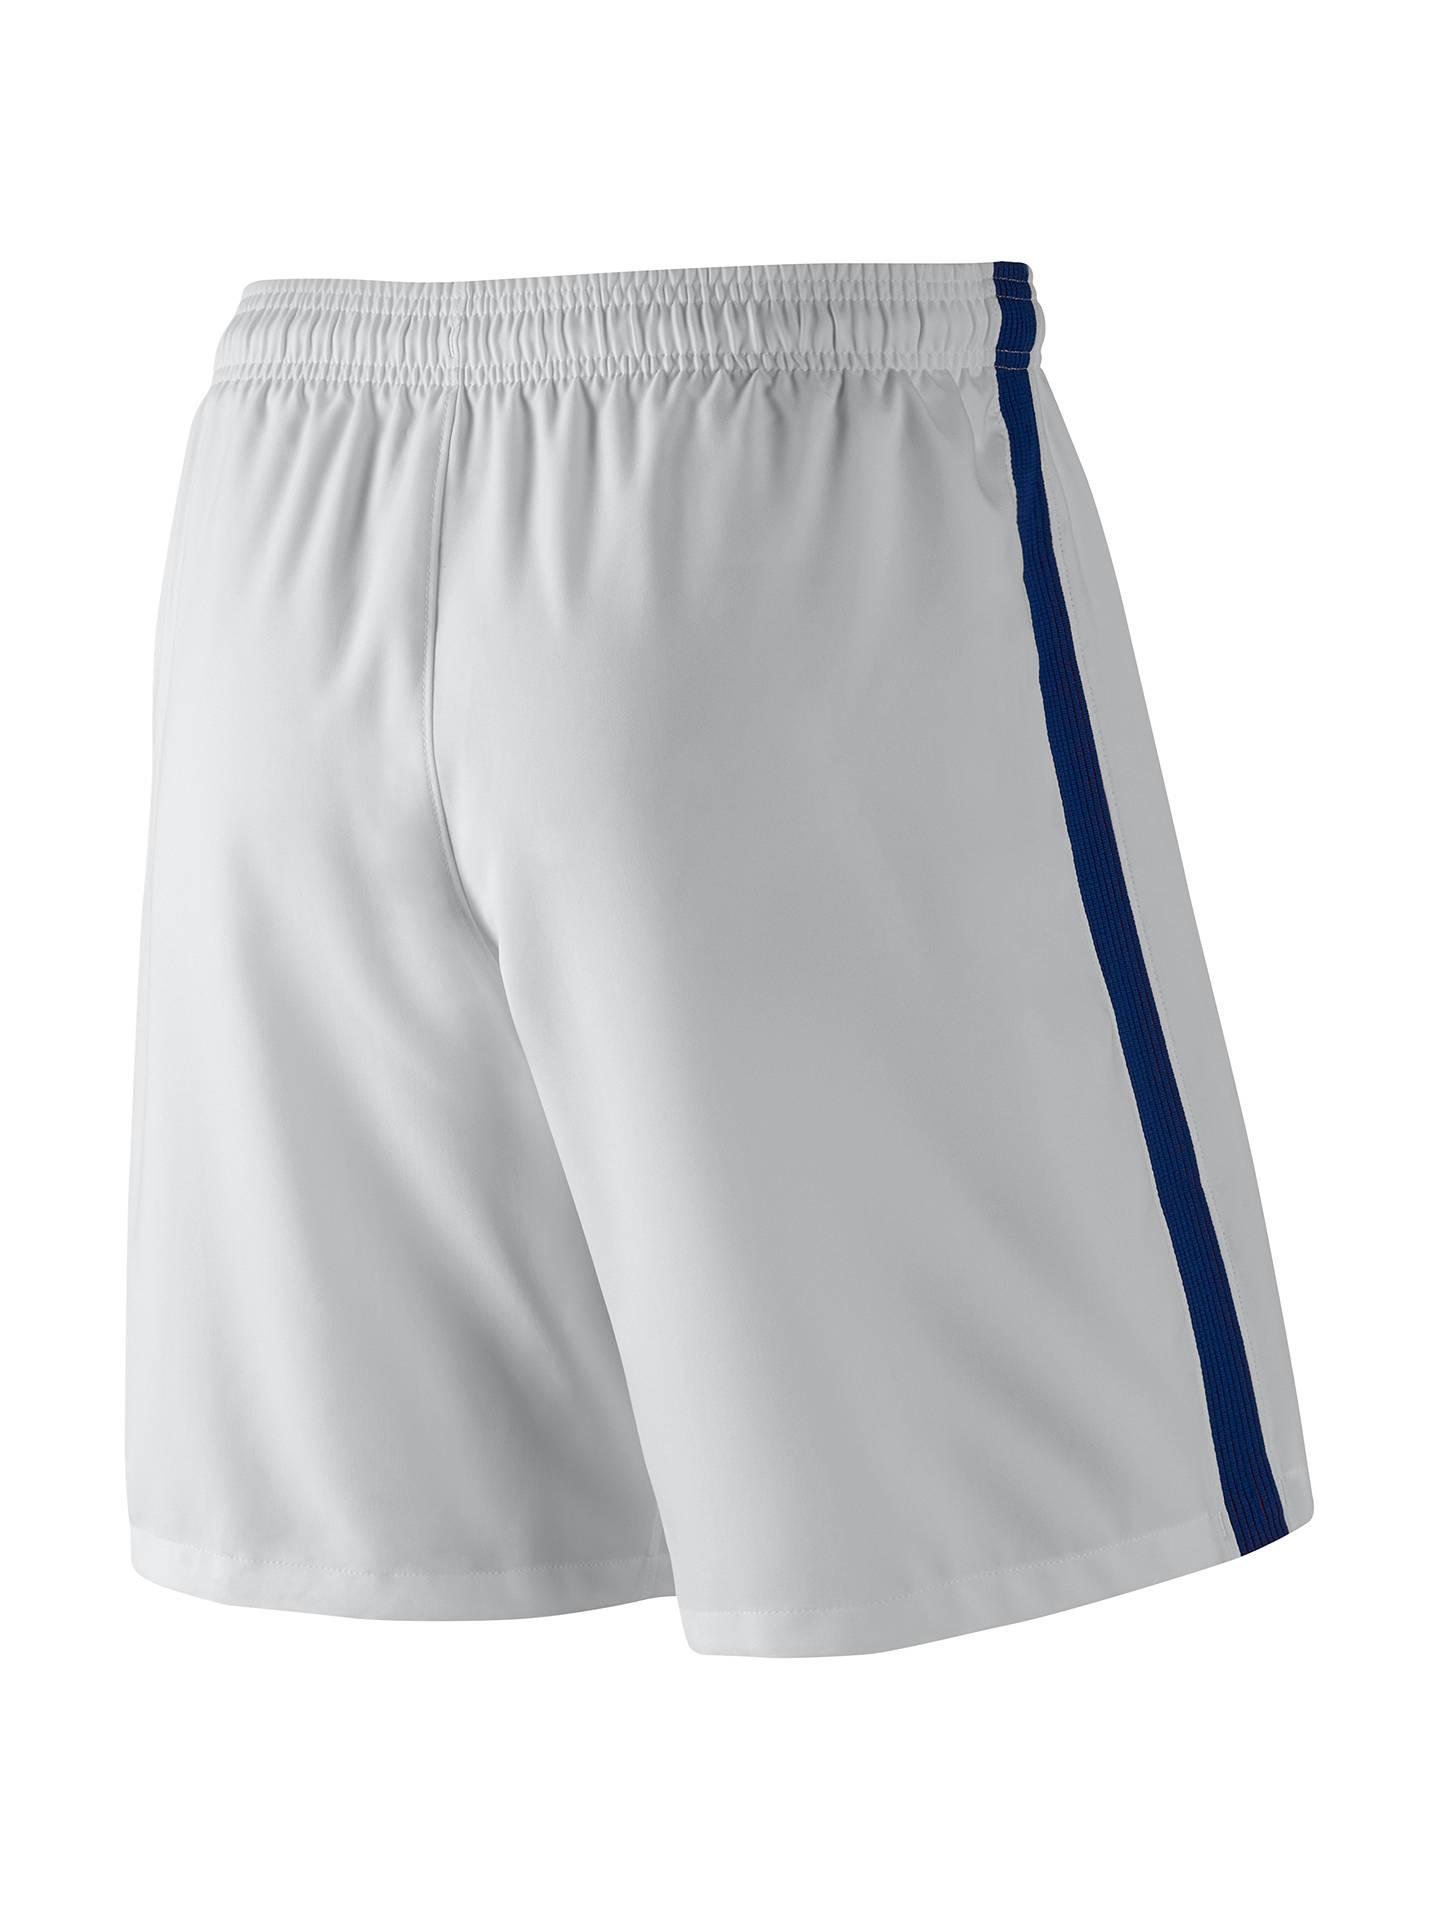 78defe5c3b33 ... Buy Nike England Stadium Football Shorts